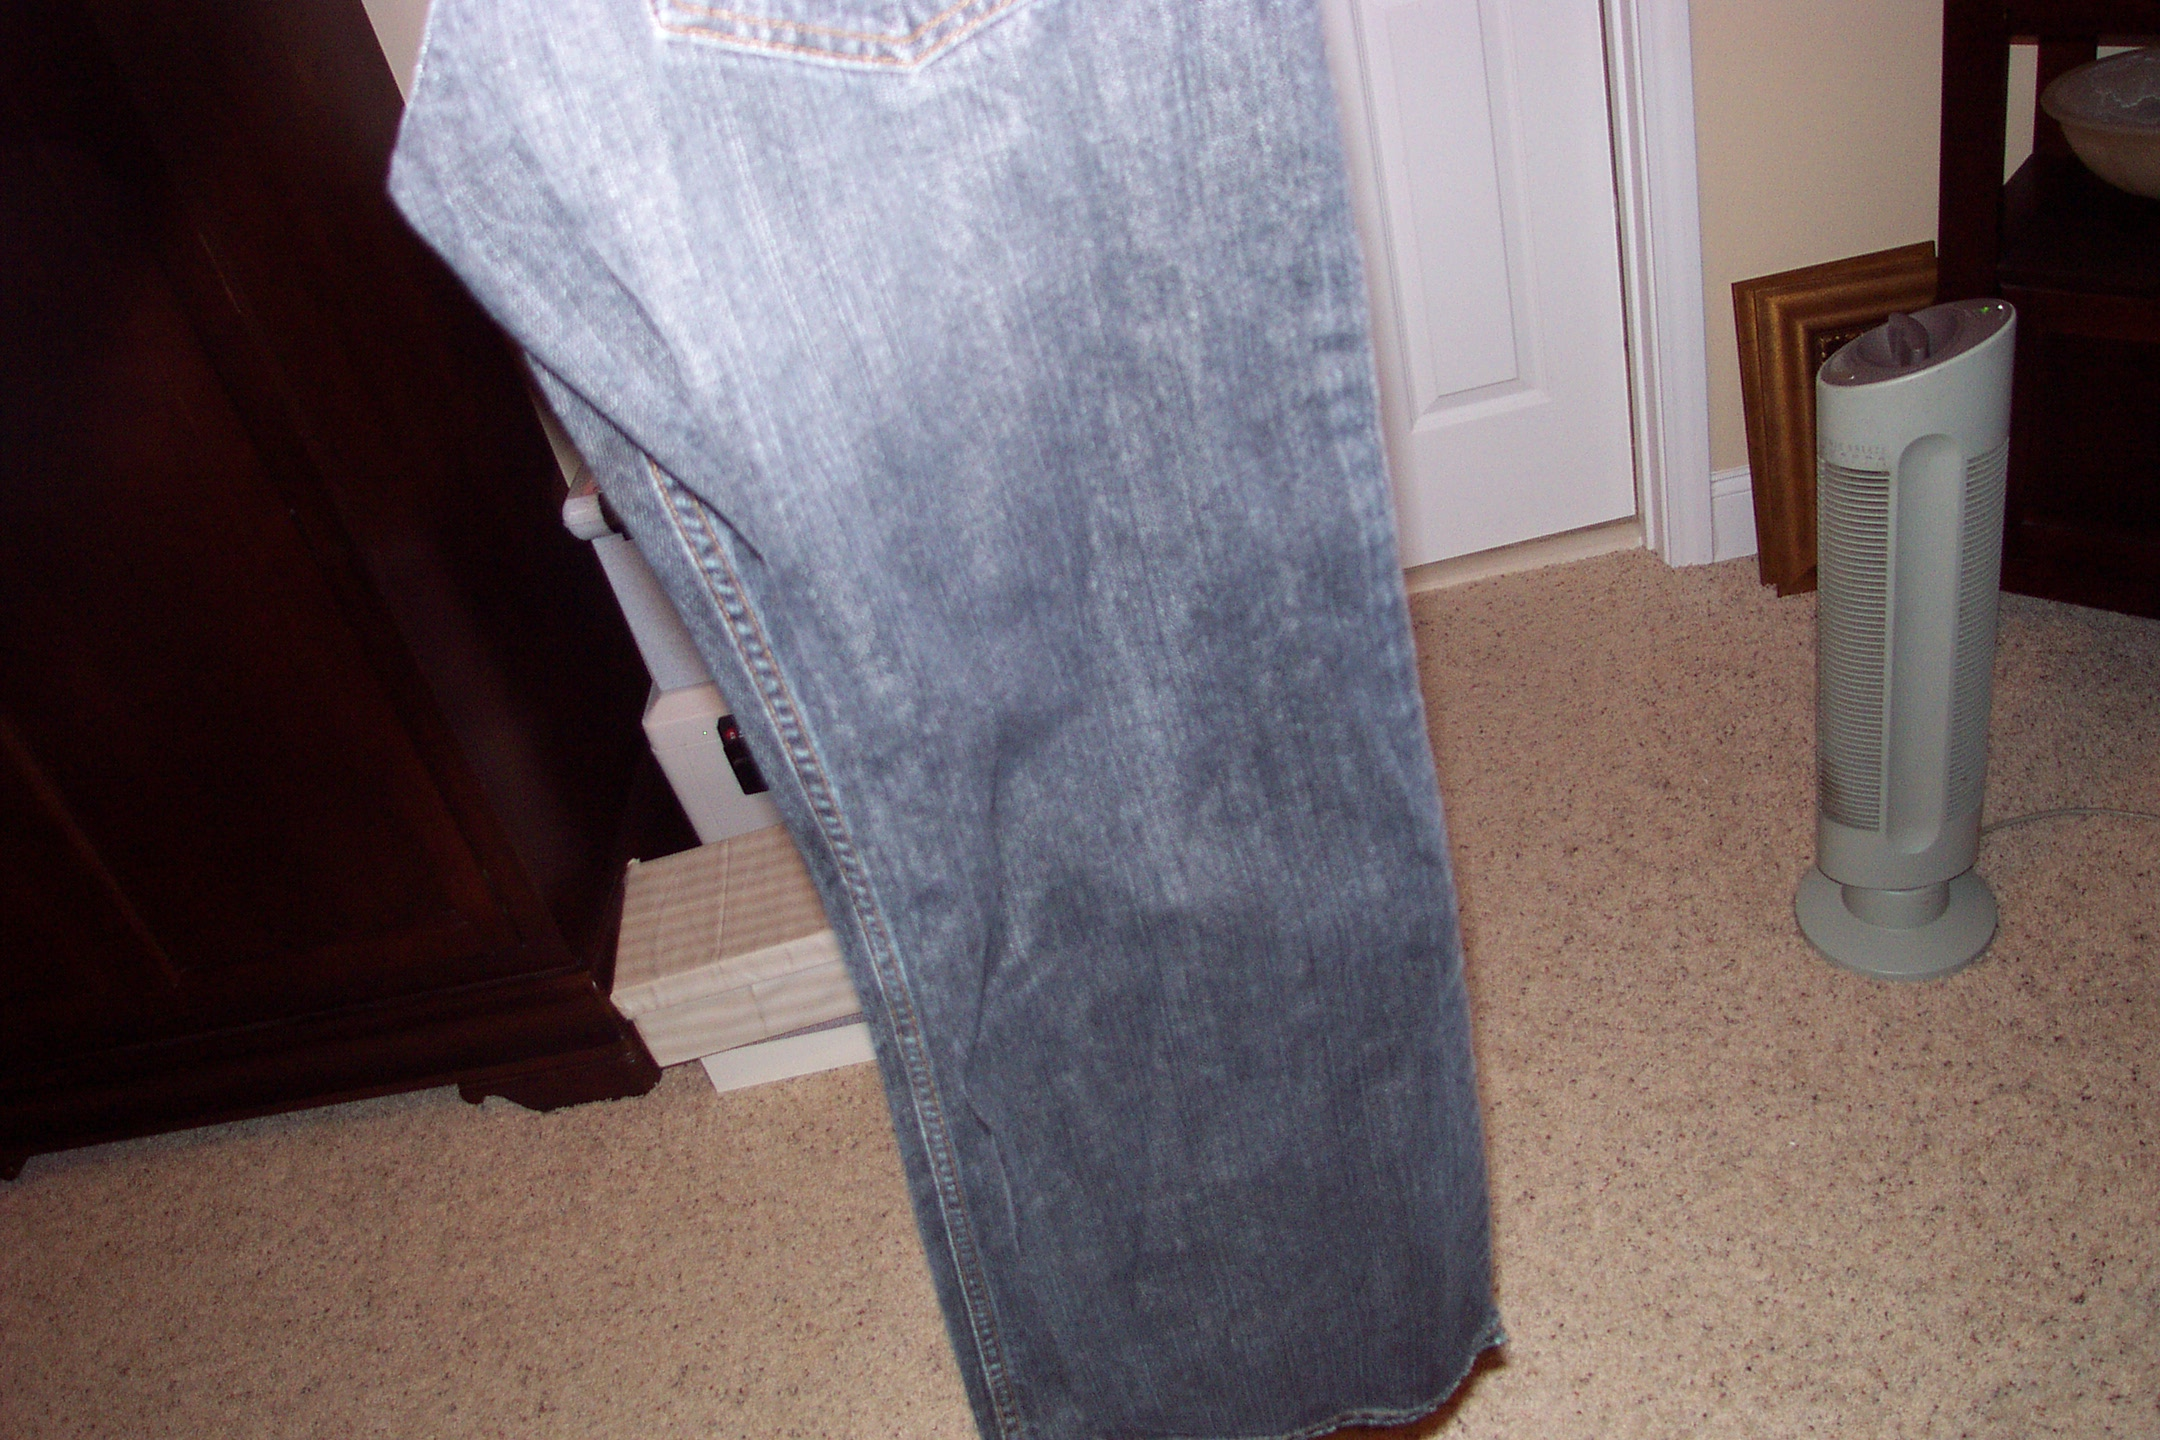 Soften Stiff Jeans